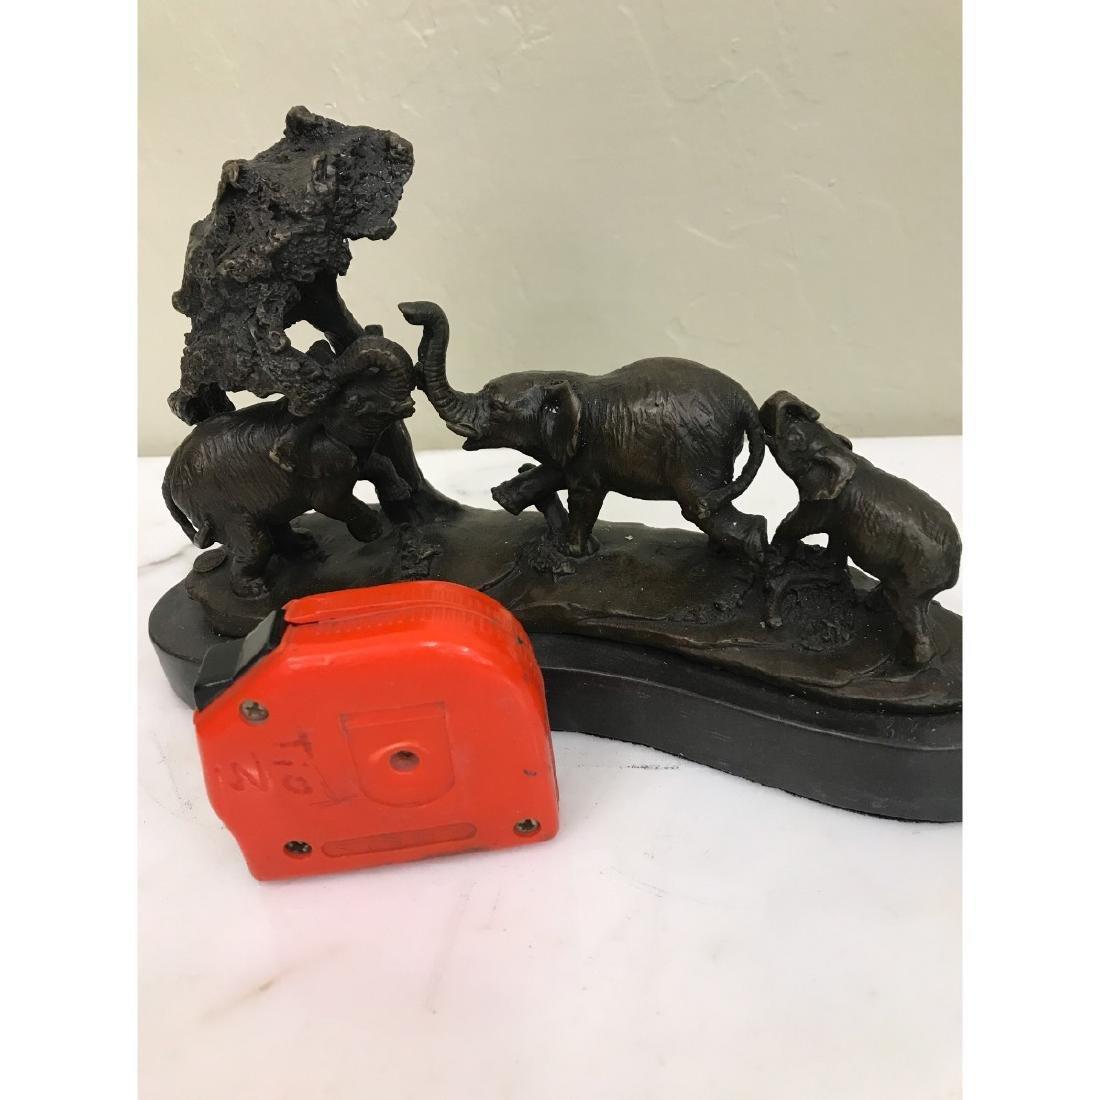 Miniature Bronze Statue of Group of Elephants - 5